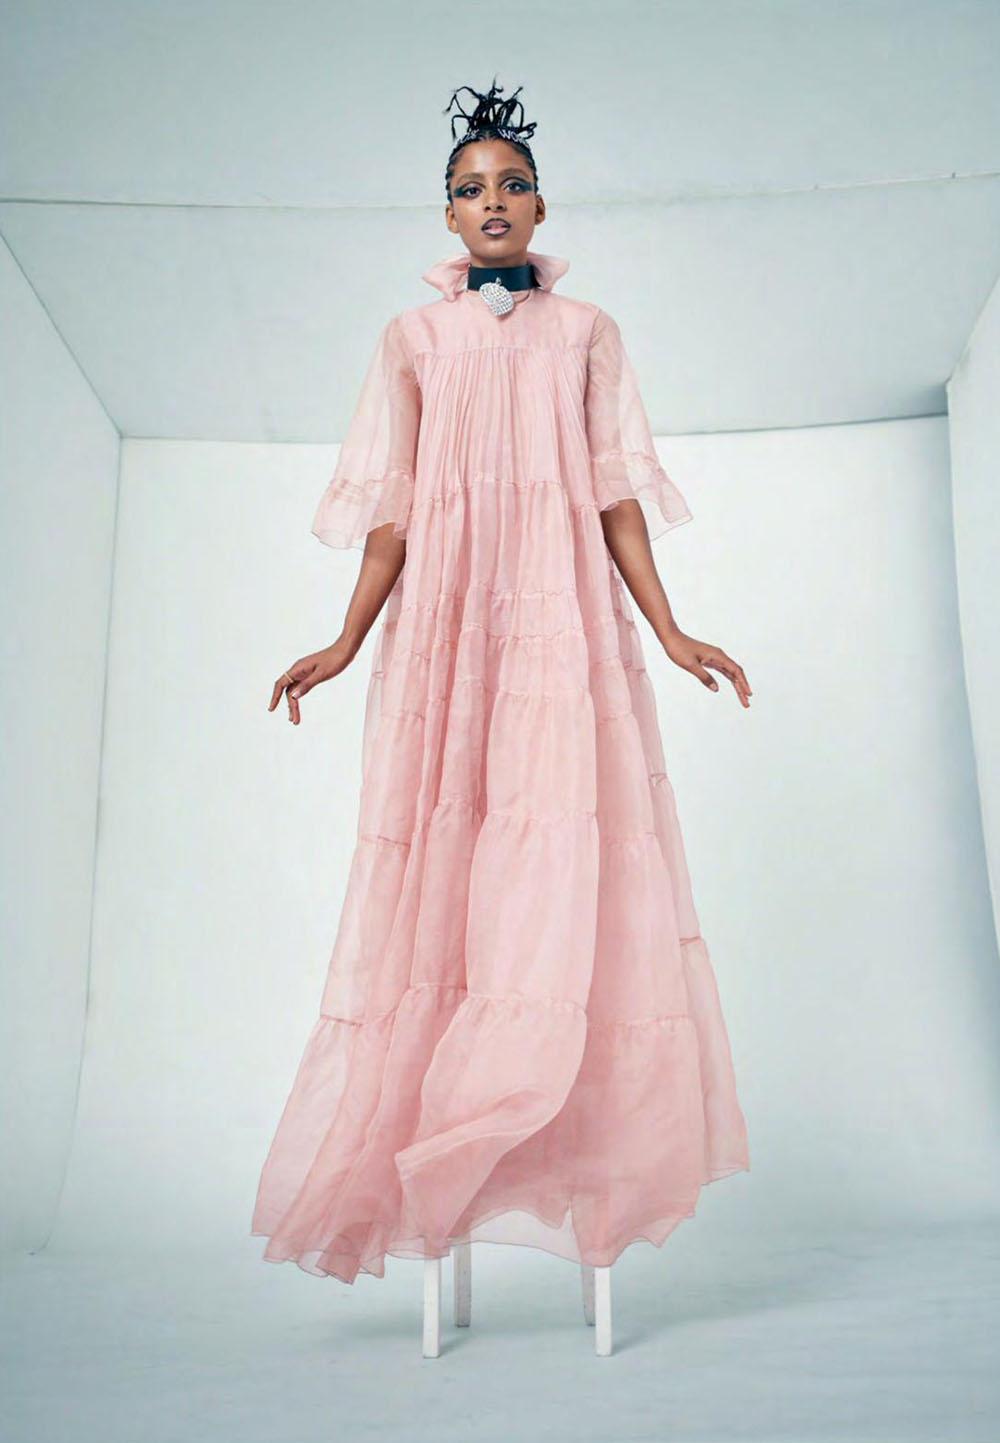 Alécia Morais by Karen Collins for Elle UK September 2019